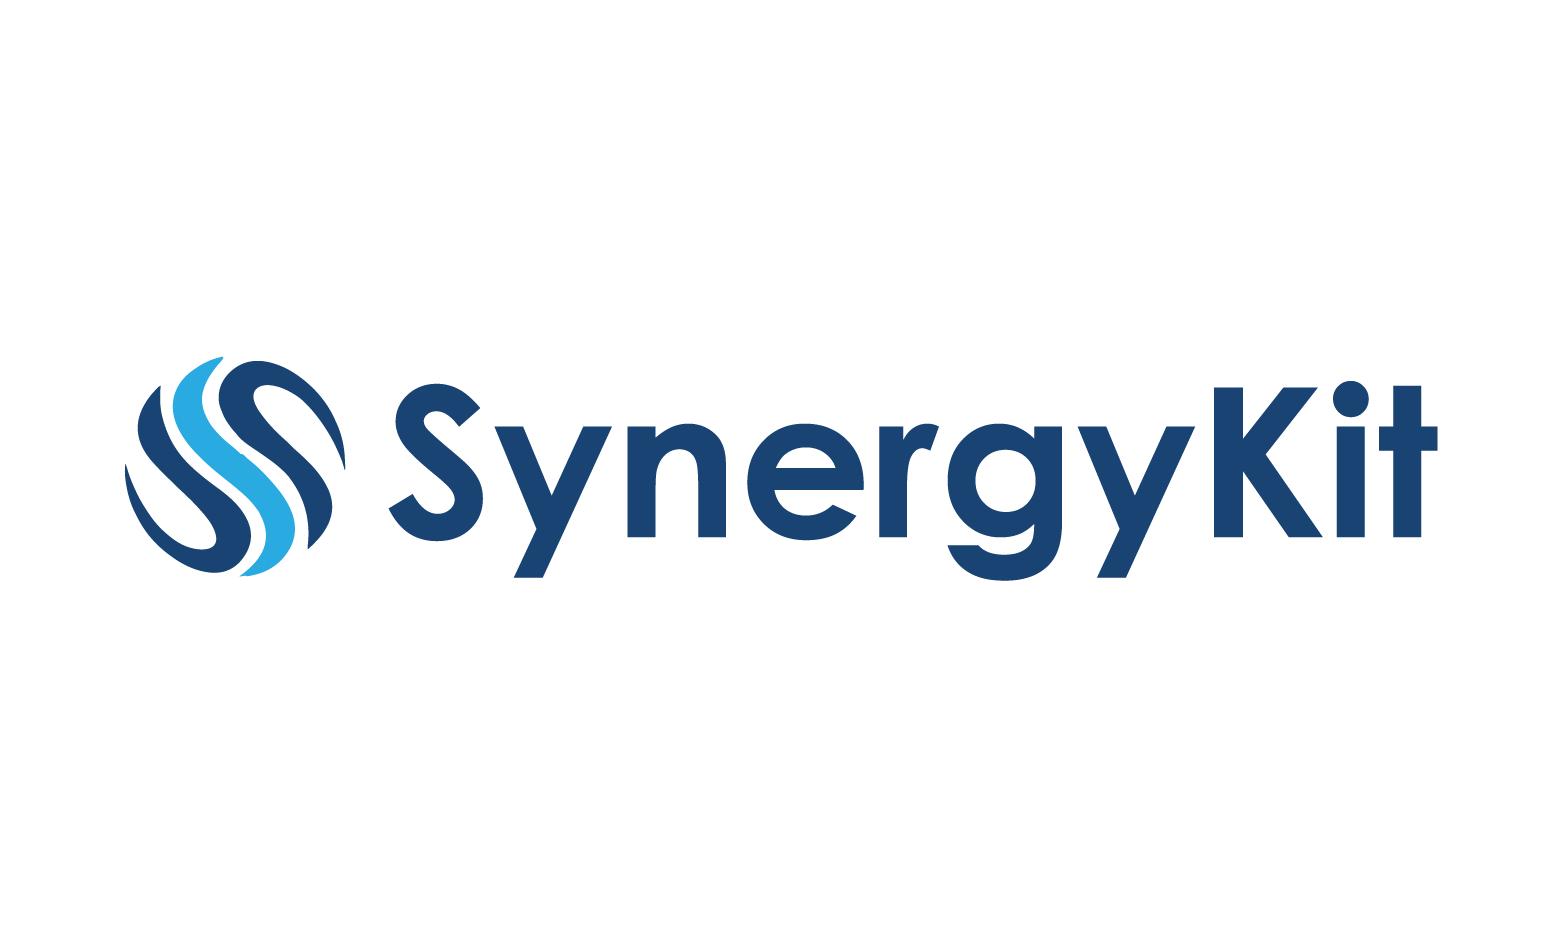 SynergyKit.com